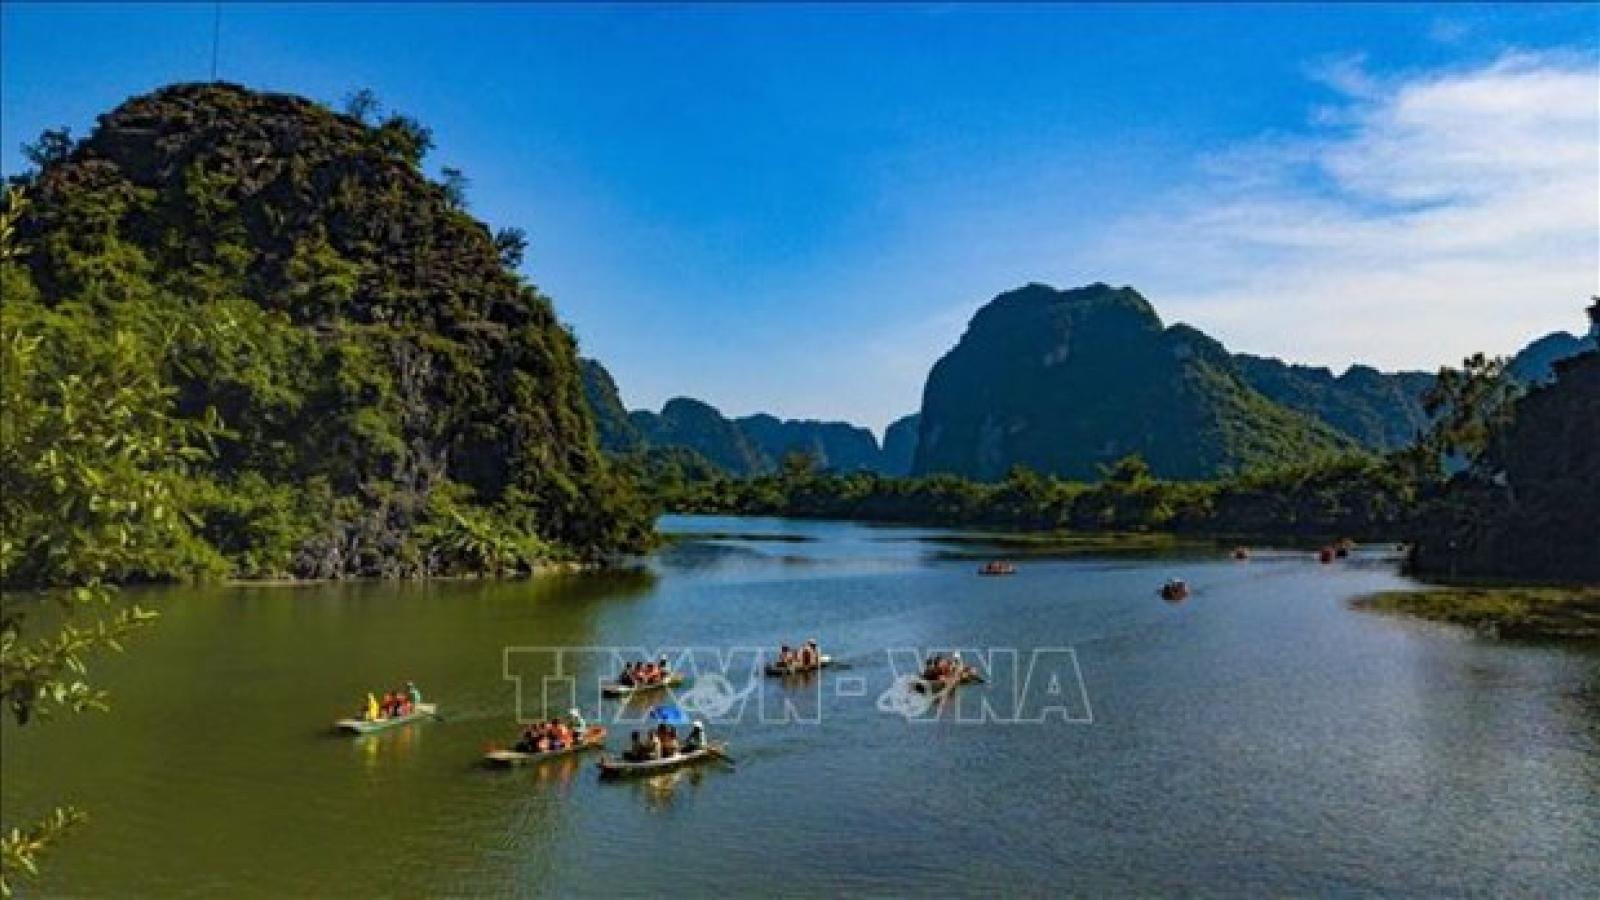 Vietnam strives to become an attractive eco-tourism destination